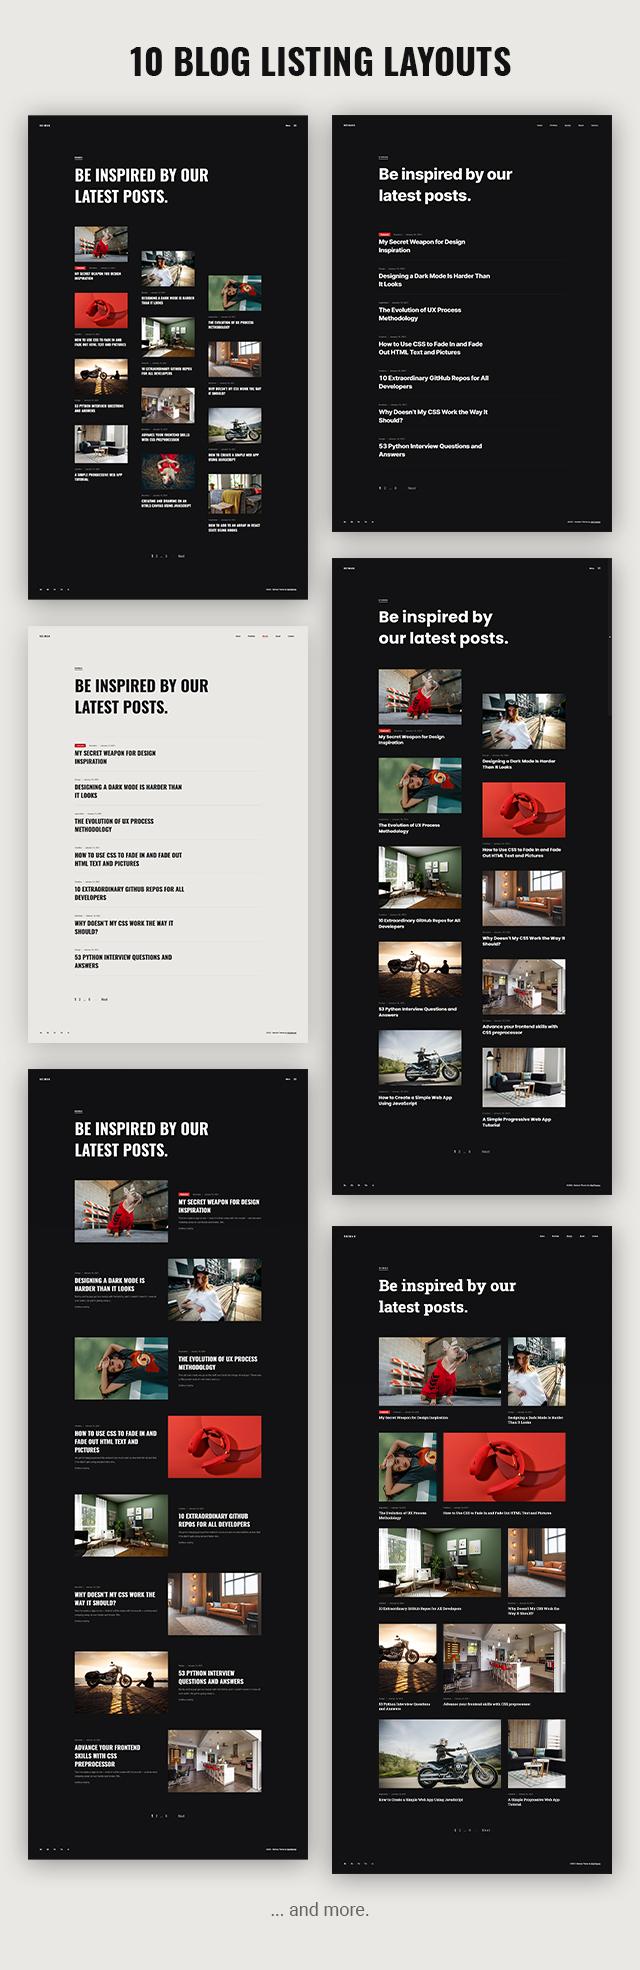 Neiman - Portfolio & Personal Blog WordPress Theme - 7